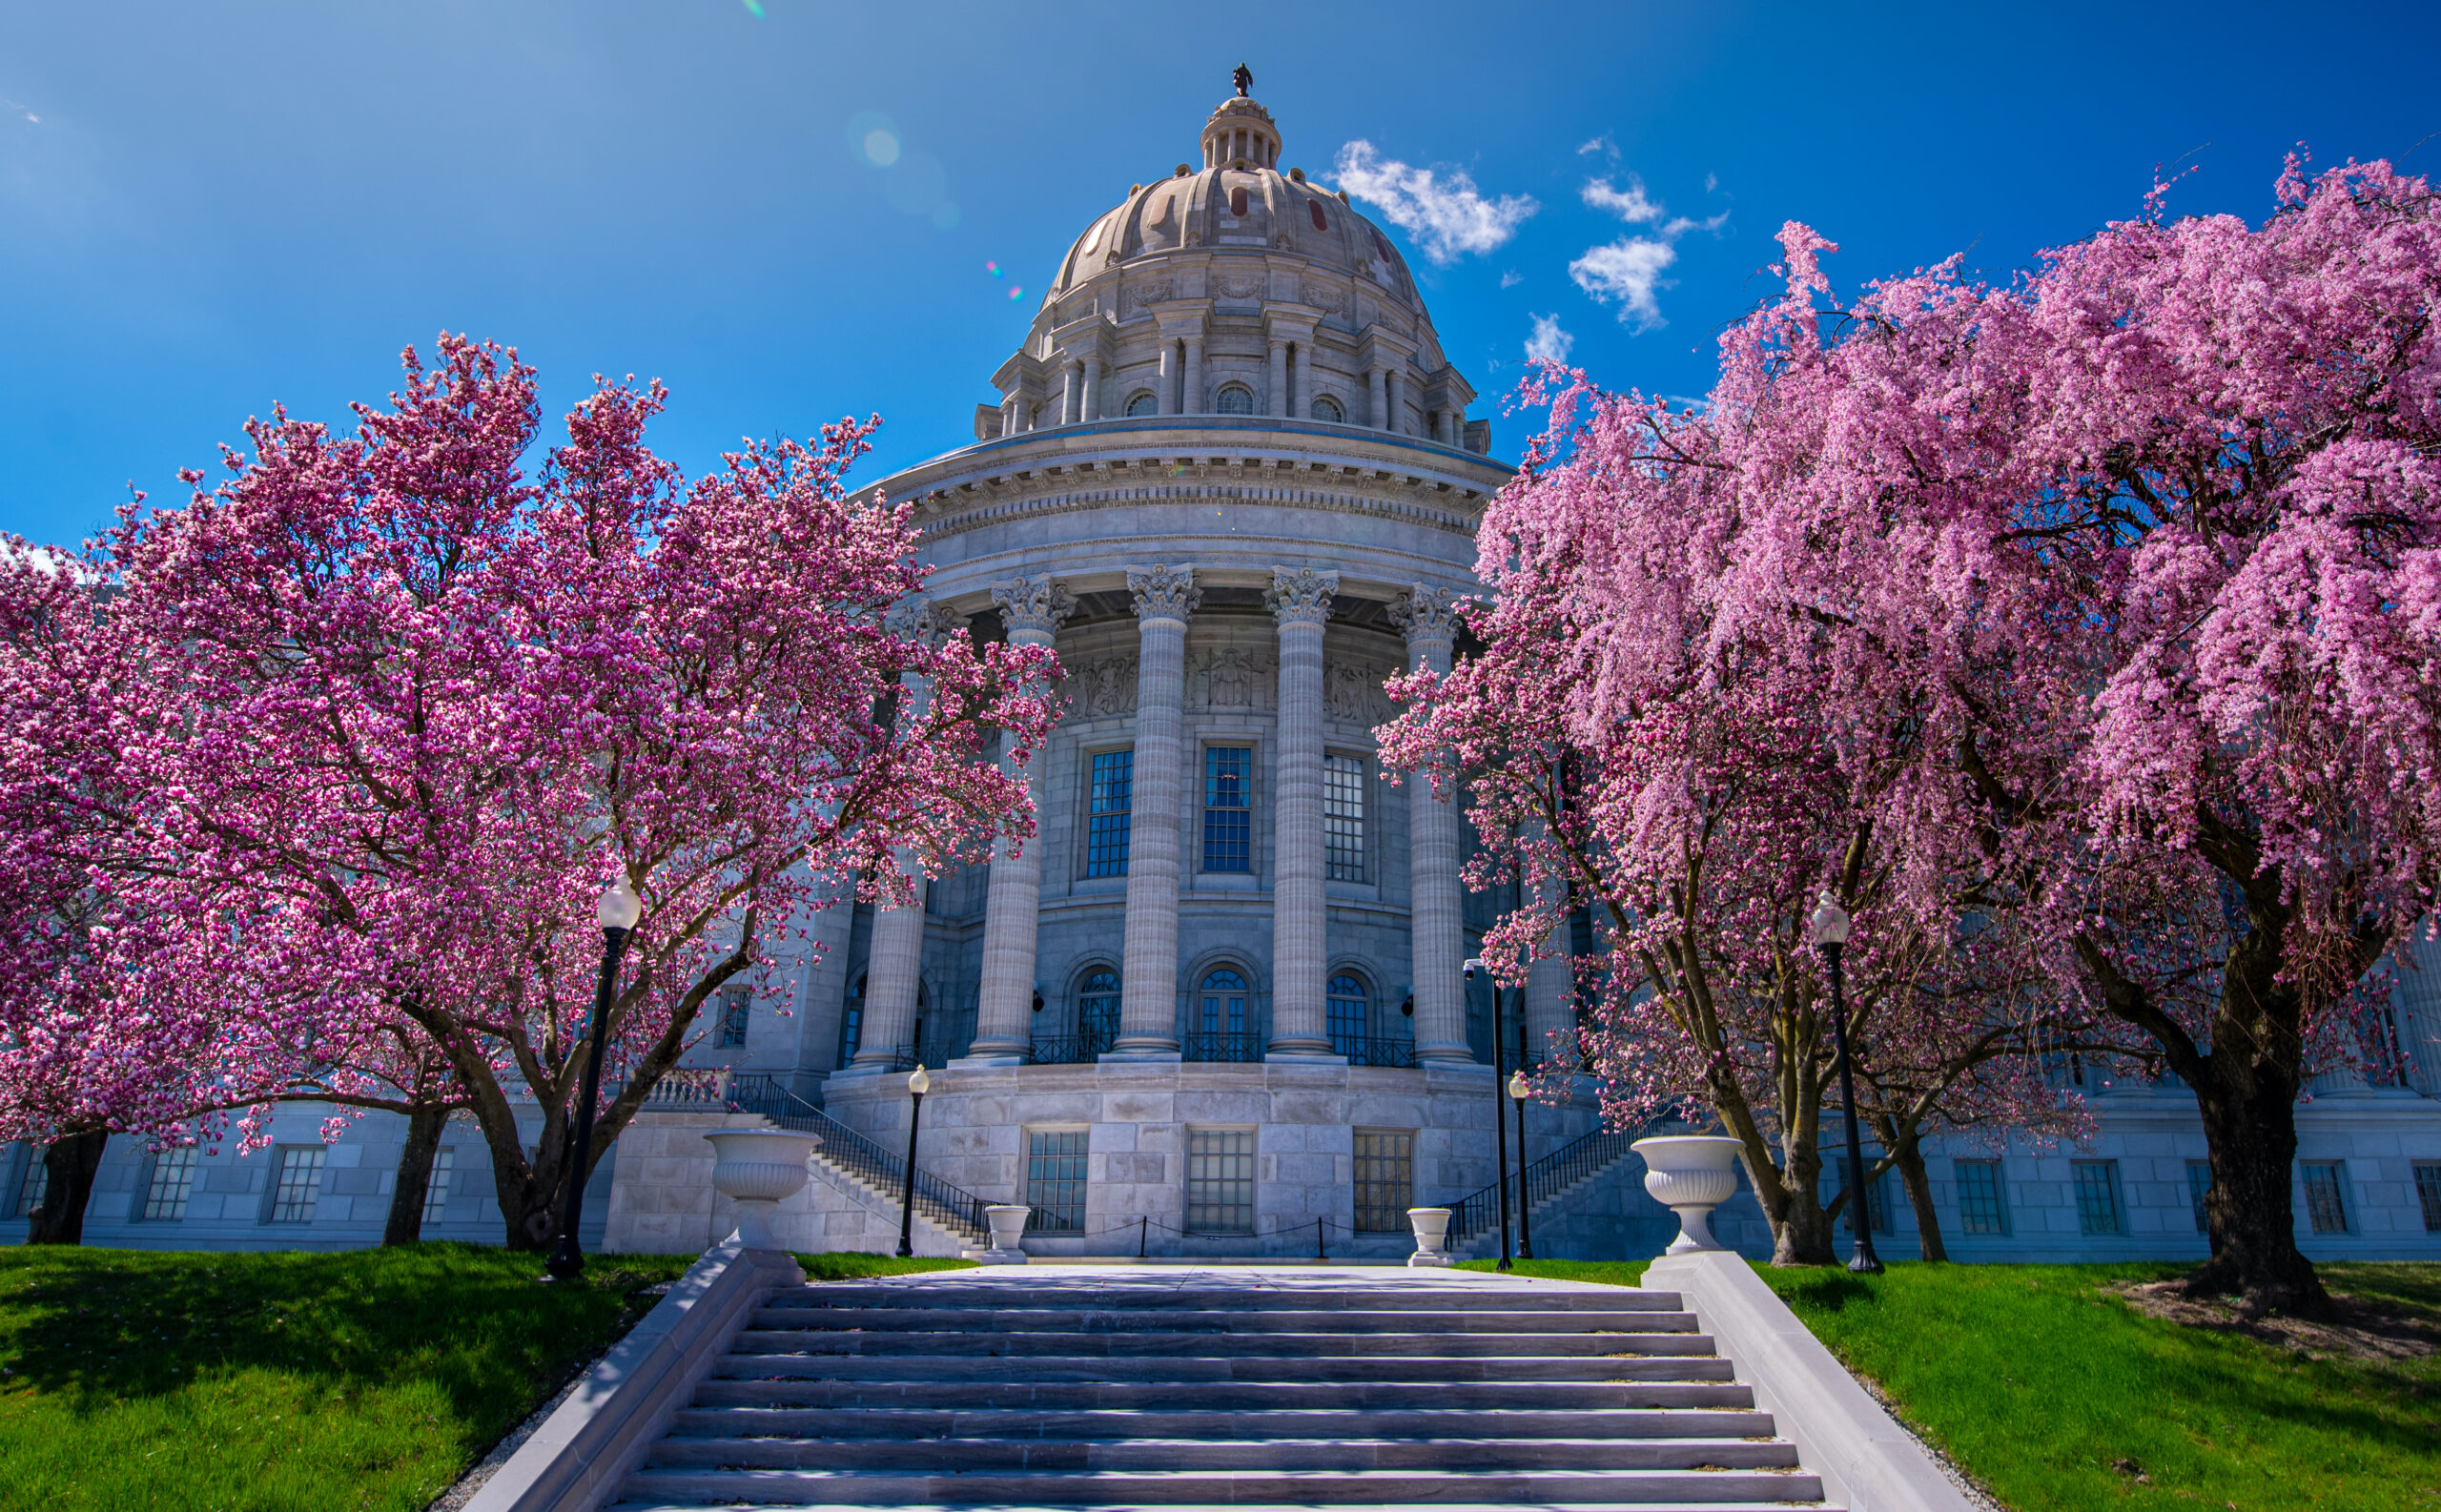 Bigots got an LGBTQ history display booted from the Missouri capitol